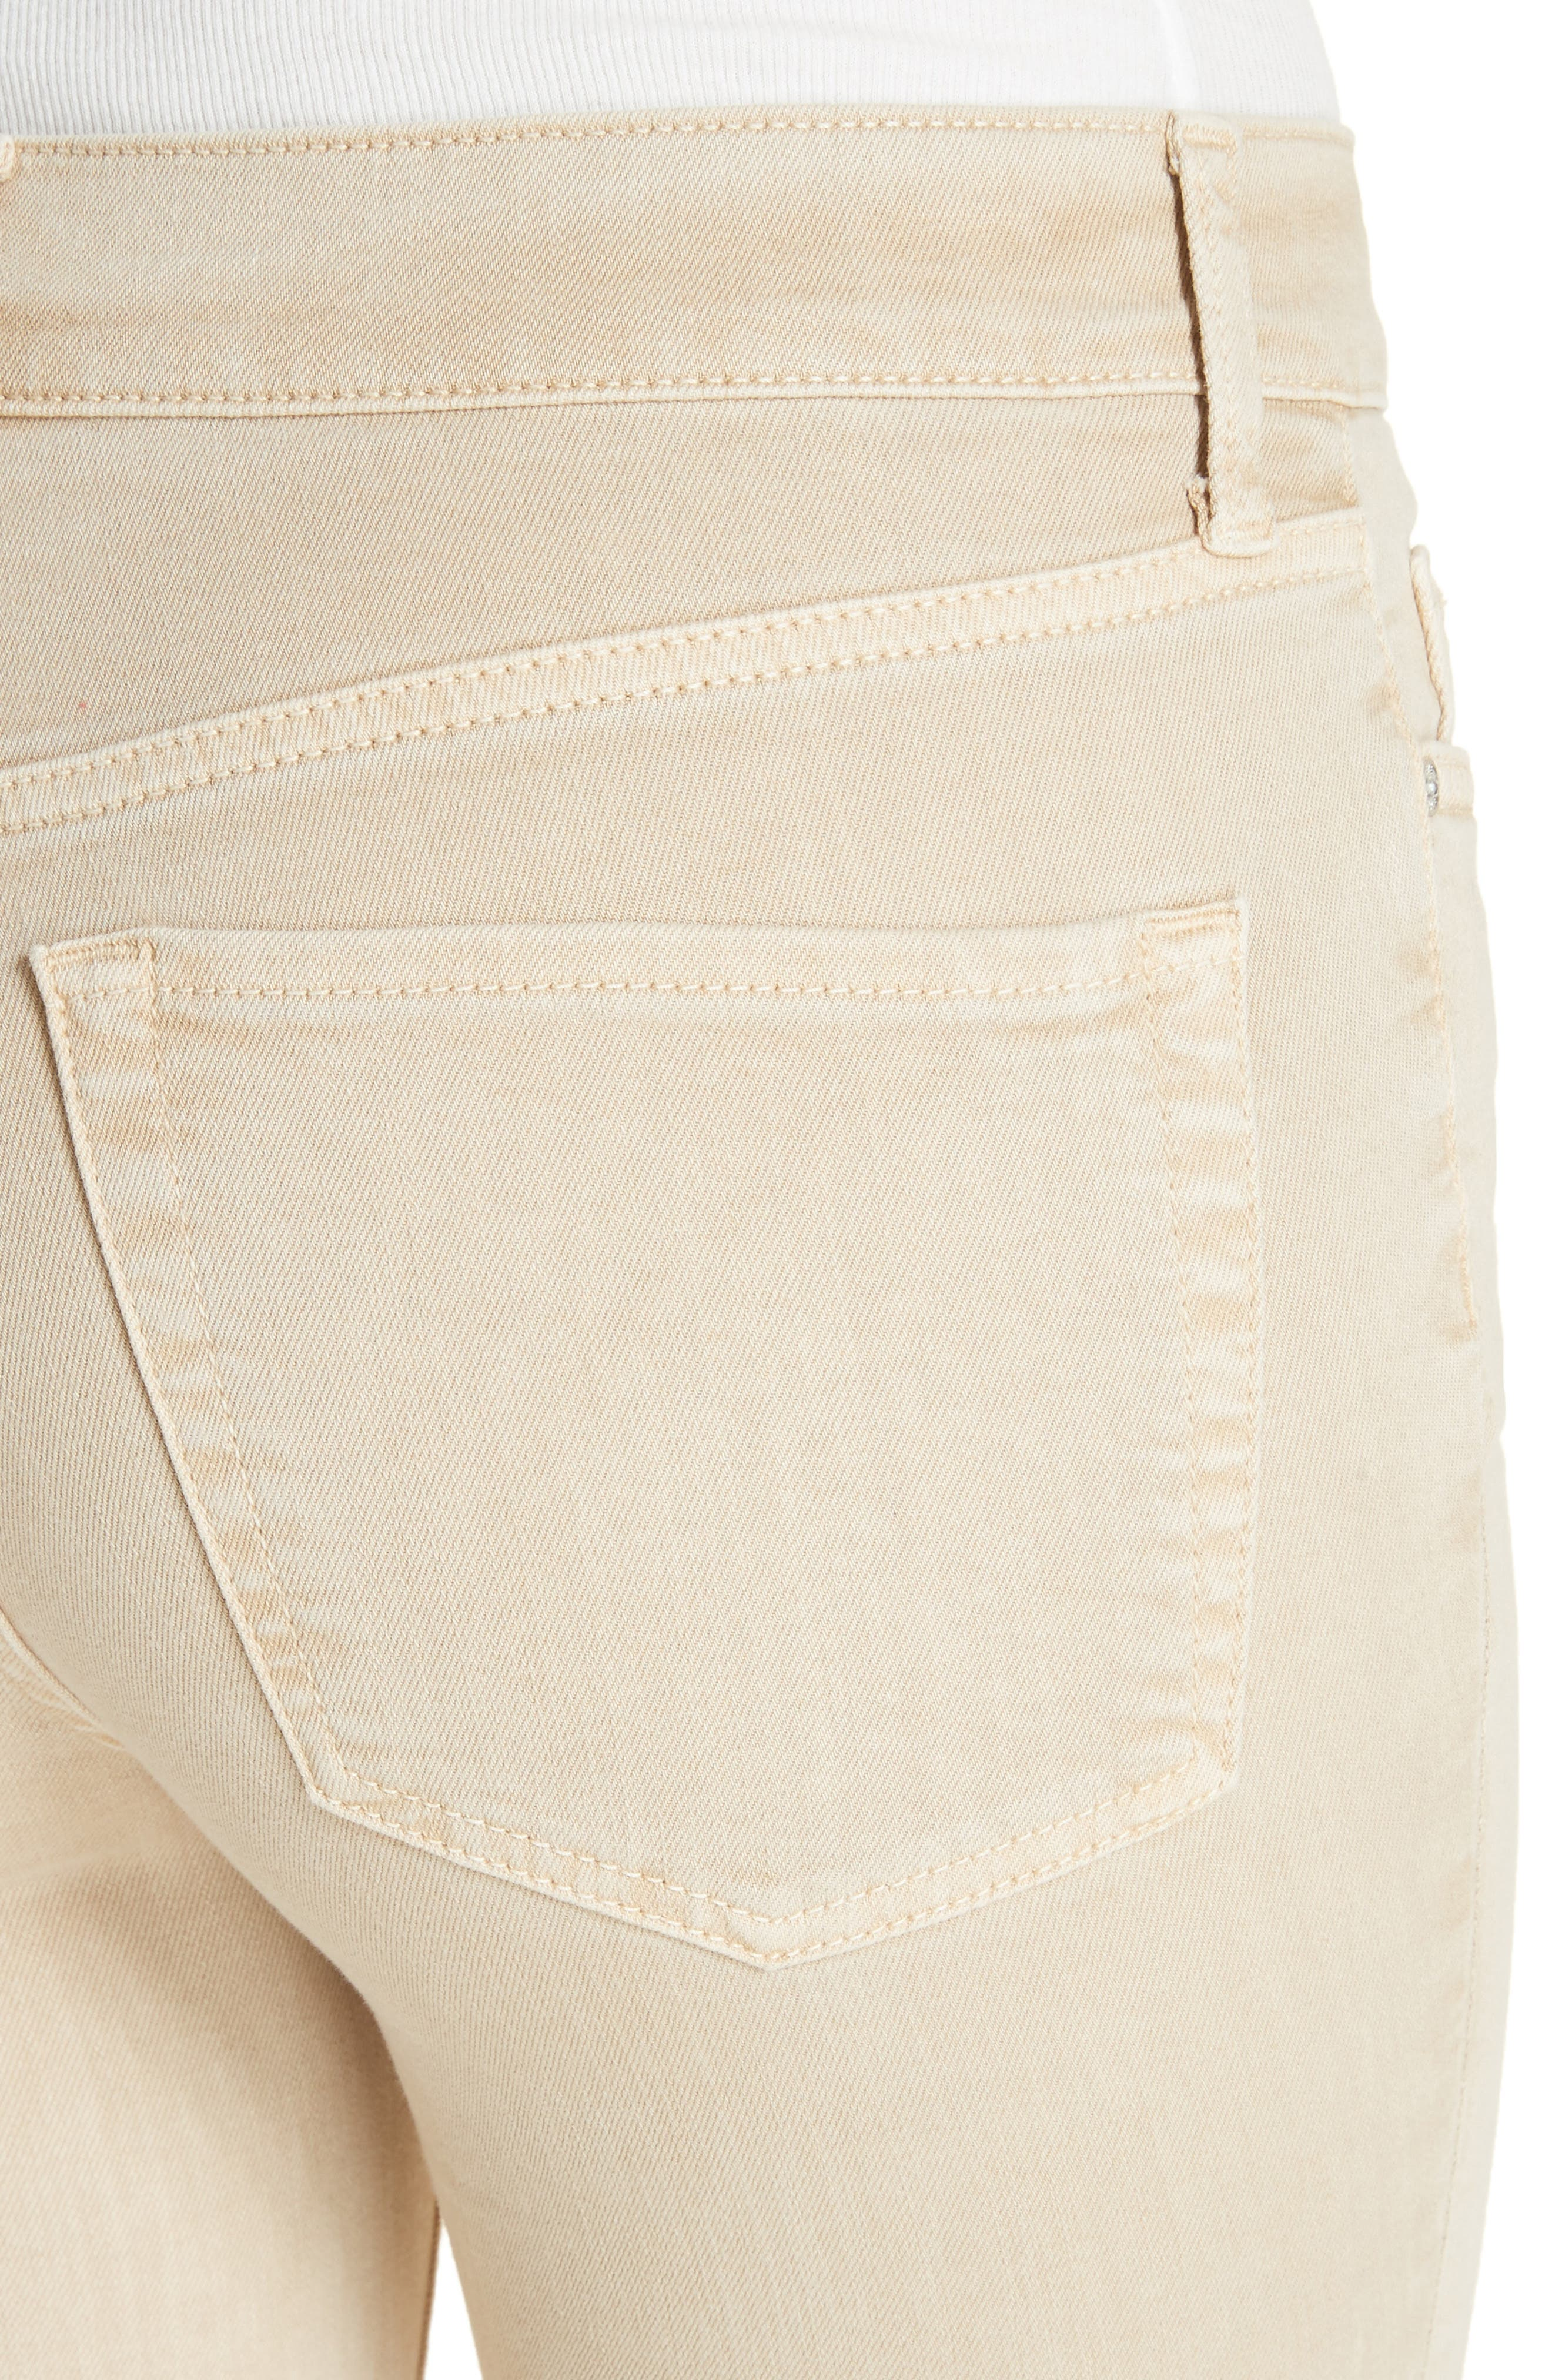 High Waist Busted Knee Skinny Jeans,                             Alternate thumbnail 4, color,                             Khaki